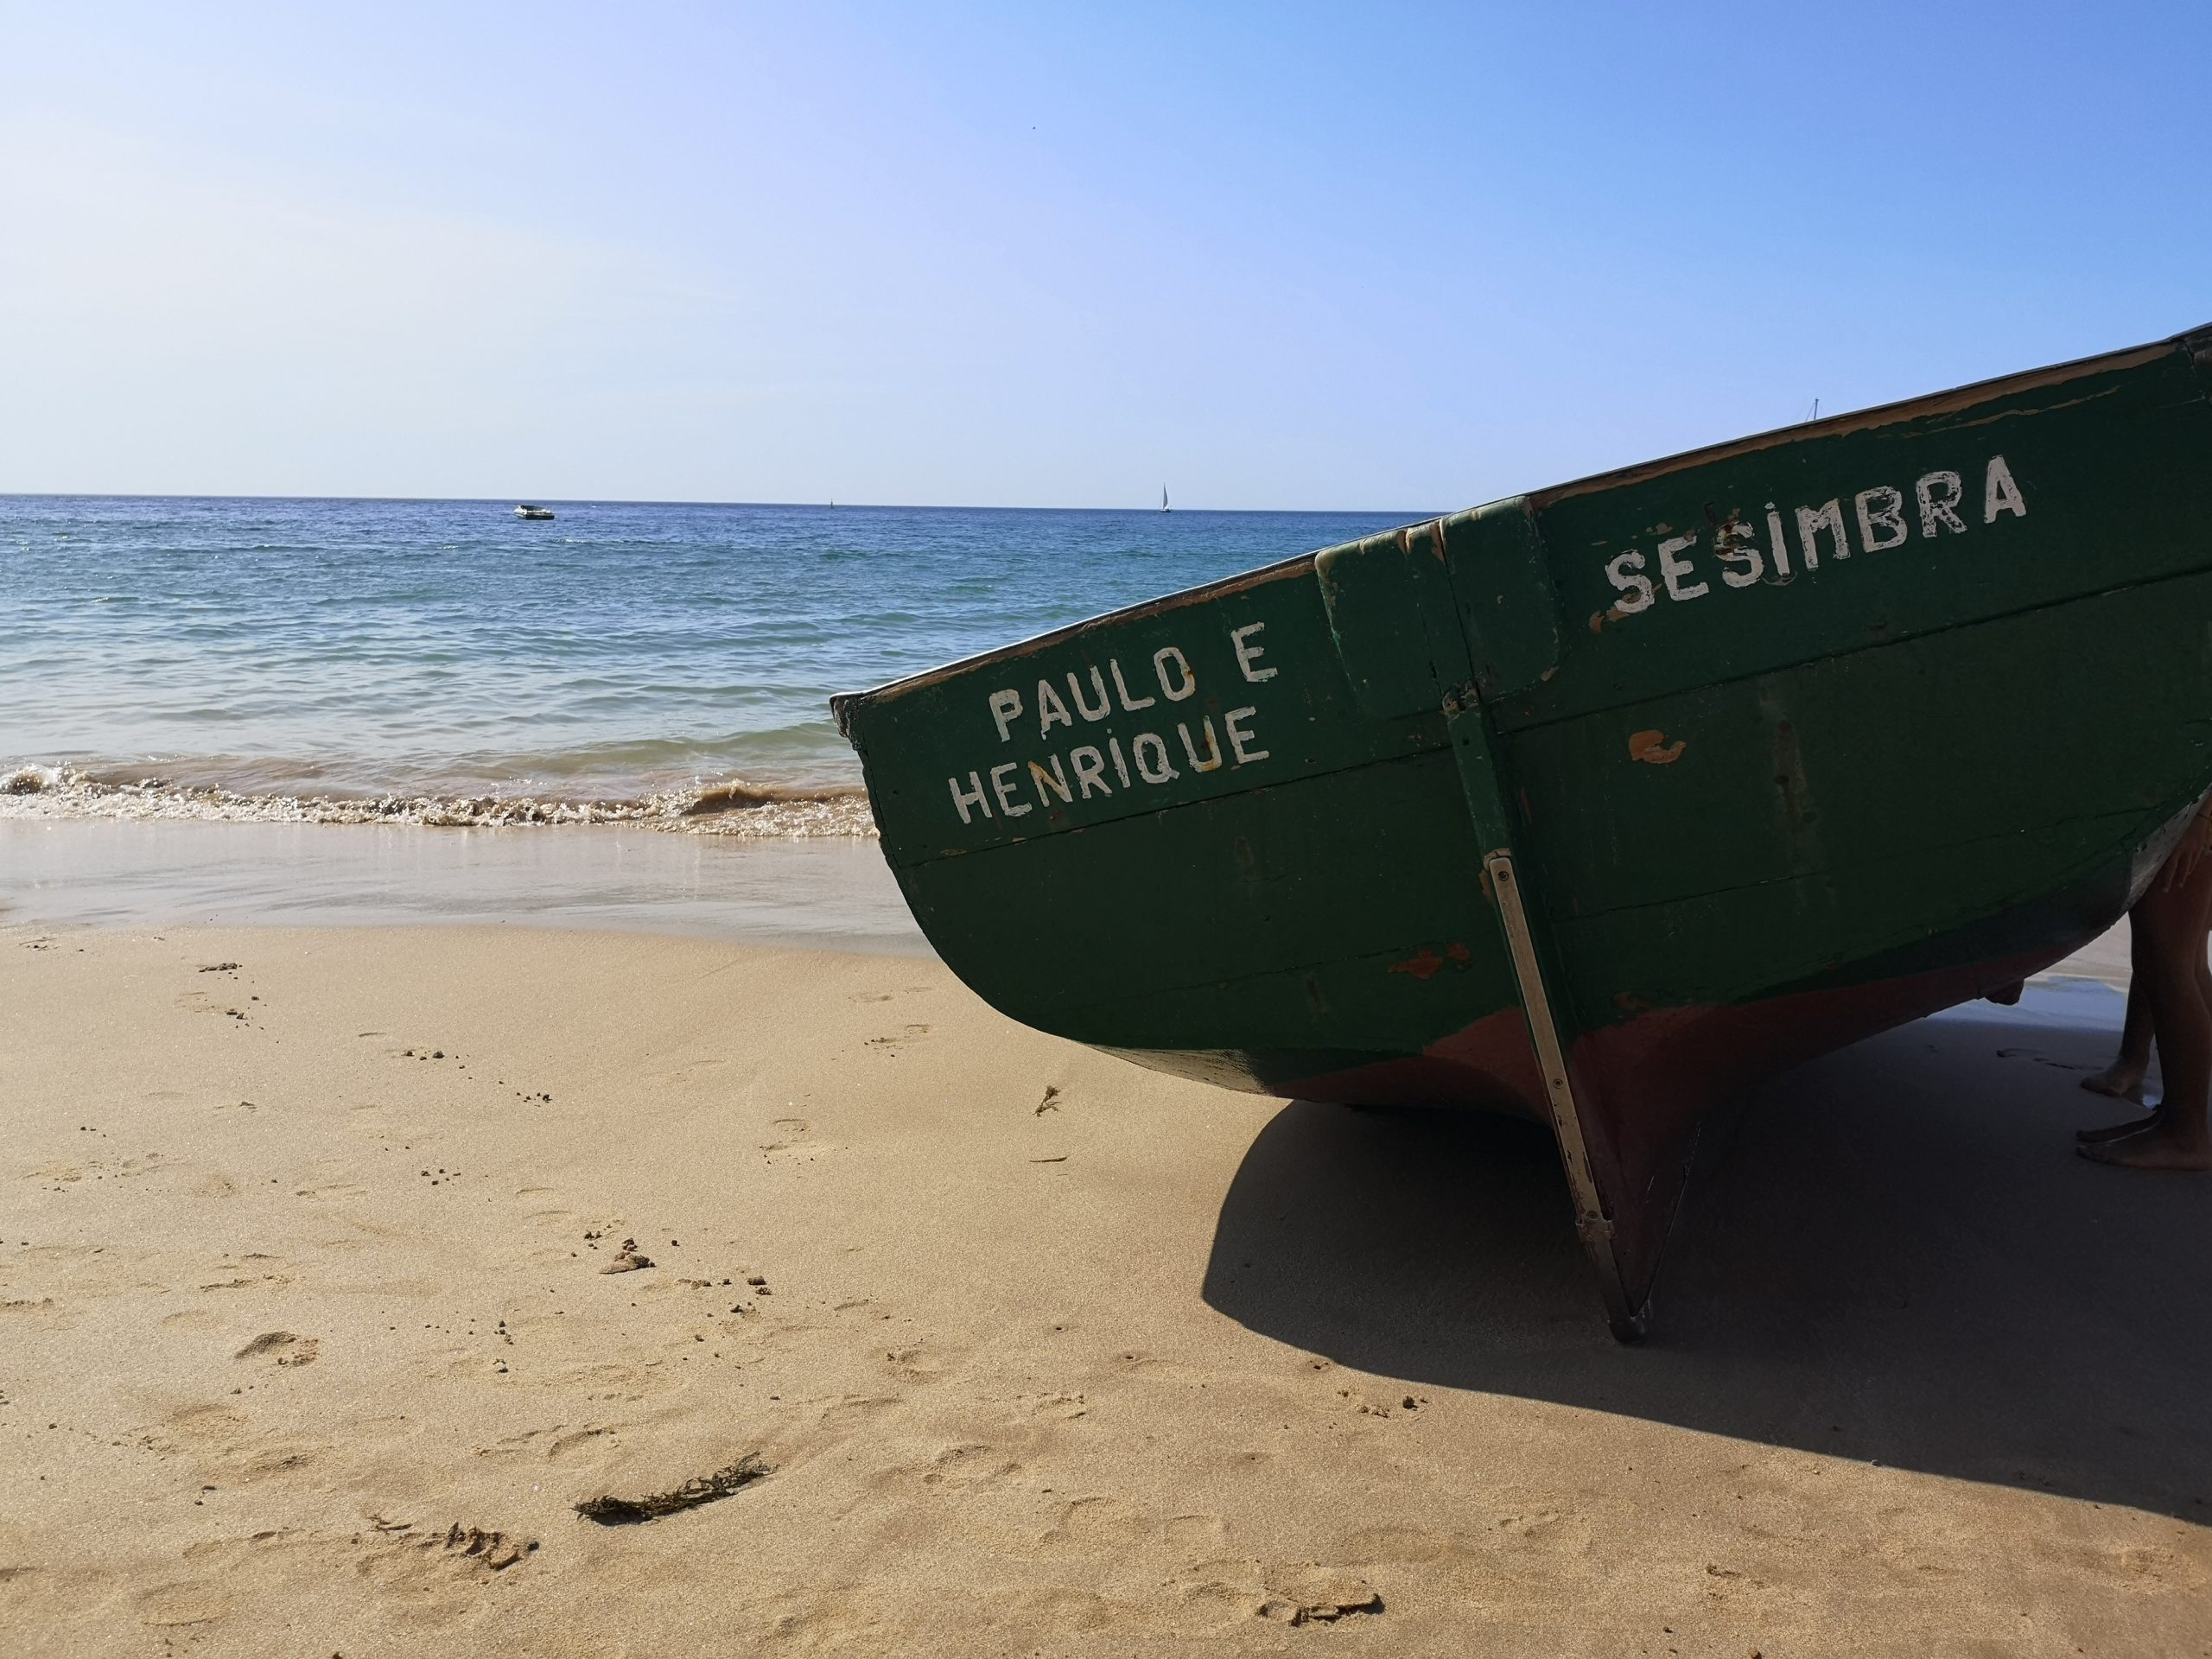 Grønn båt på stranden i Sesimbra, Portugal. Foto: Kristin Eliassen